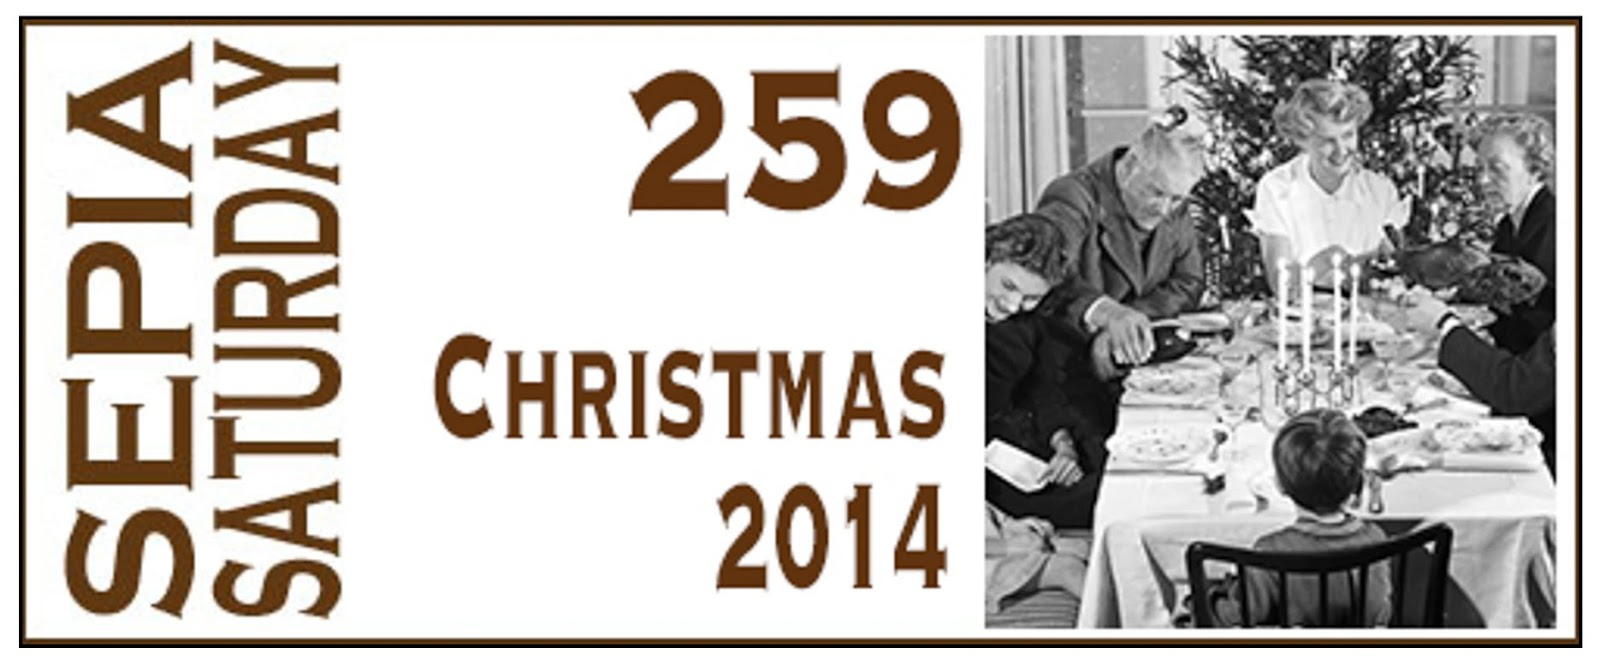 http://sepiasaturday.blogspot.com/2014/12/sepia-saturday-259-christmas-and-new.html